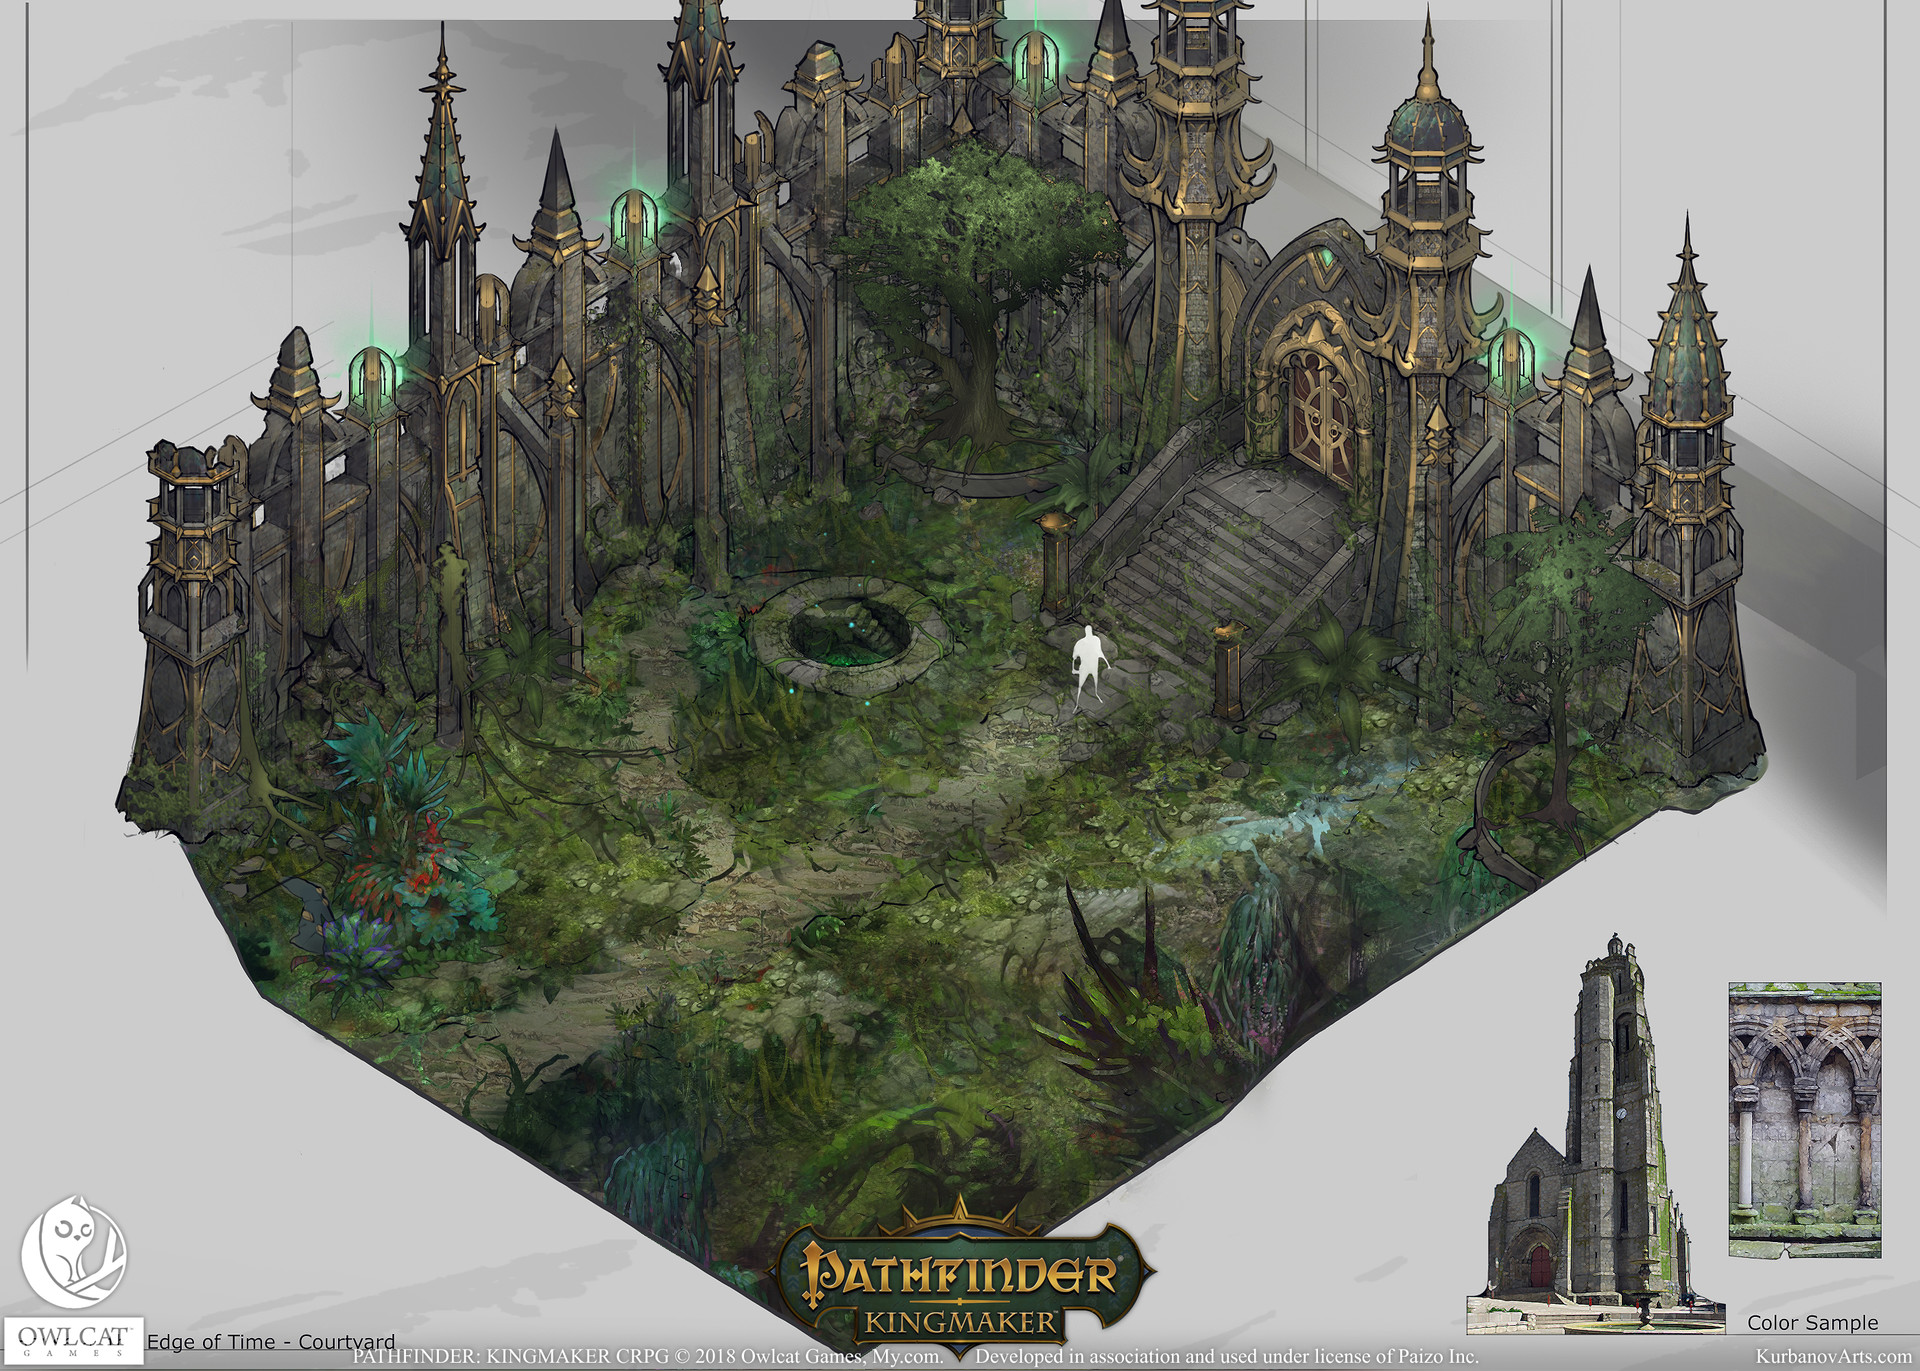 ArtStation - Pathfinder: Kingmaker - House at the Edge of